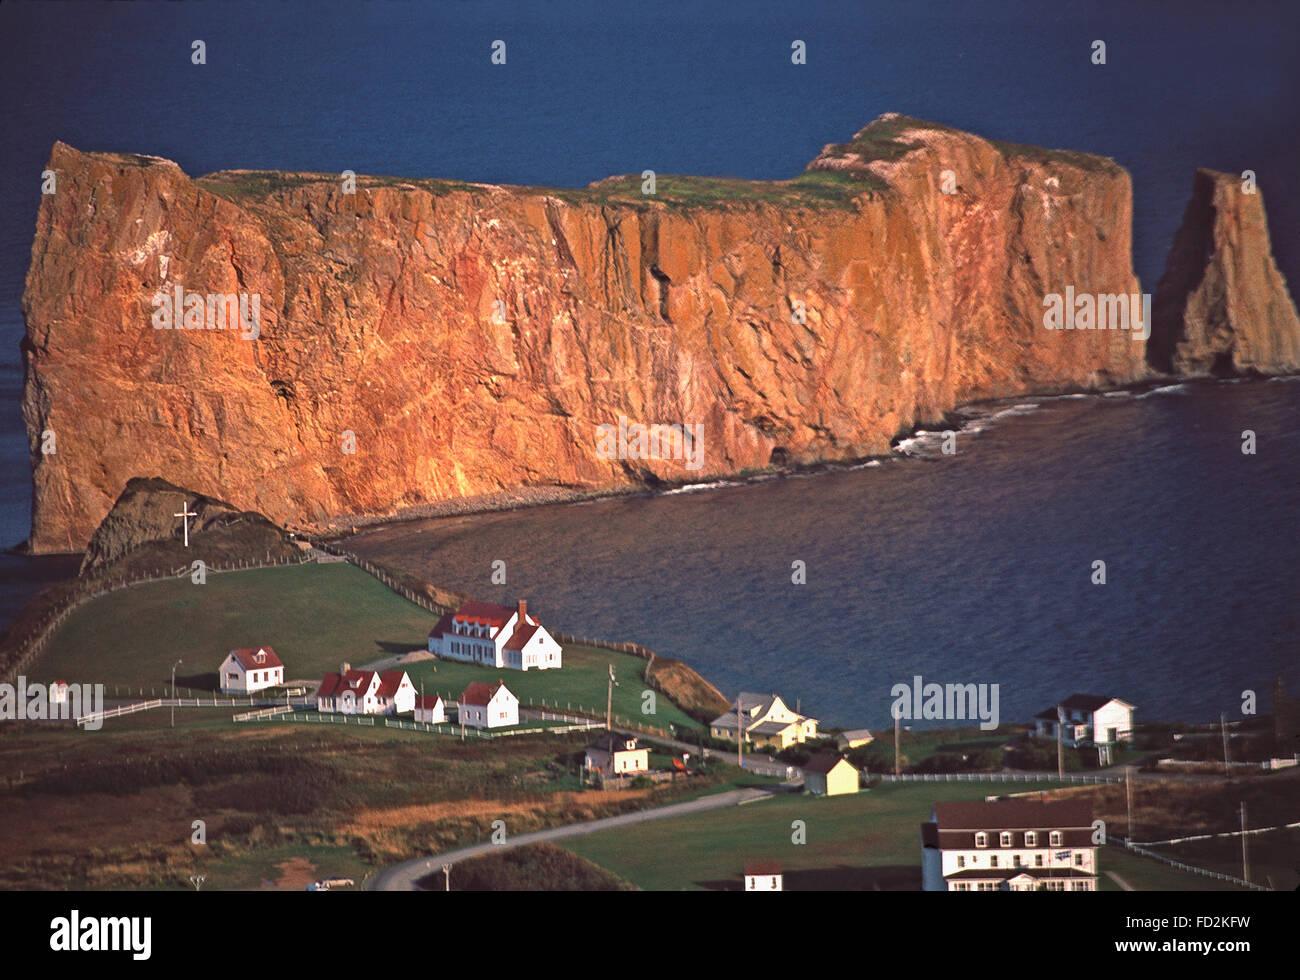 Perce Rock,Gaspe Peninsula,Quebec - Stock Image